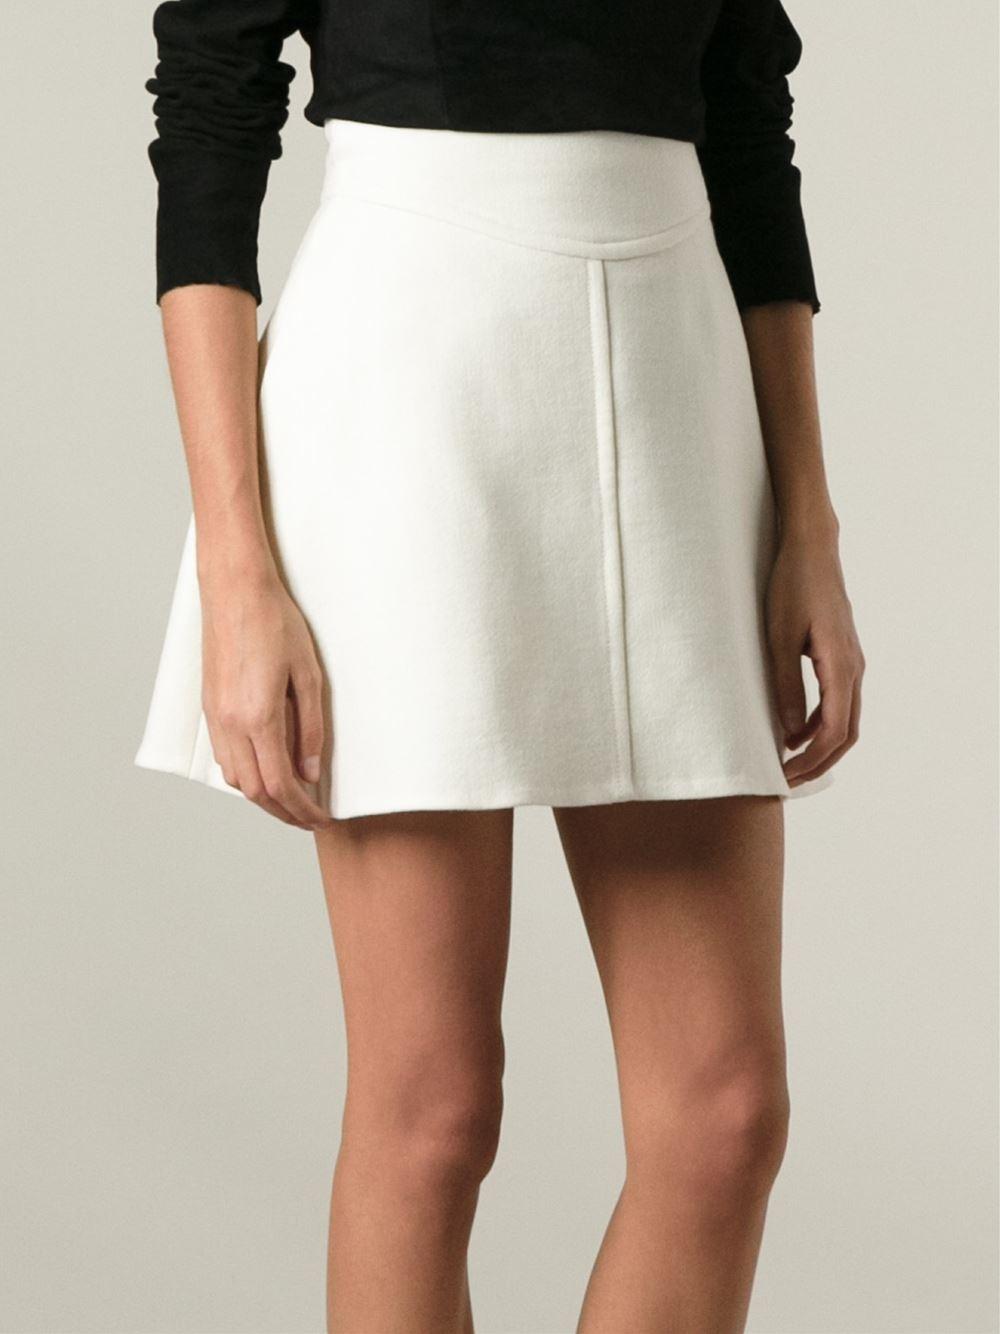 Lyst - Carven Short A-Line Skirt in White